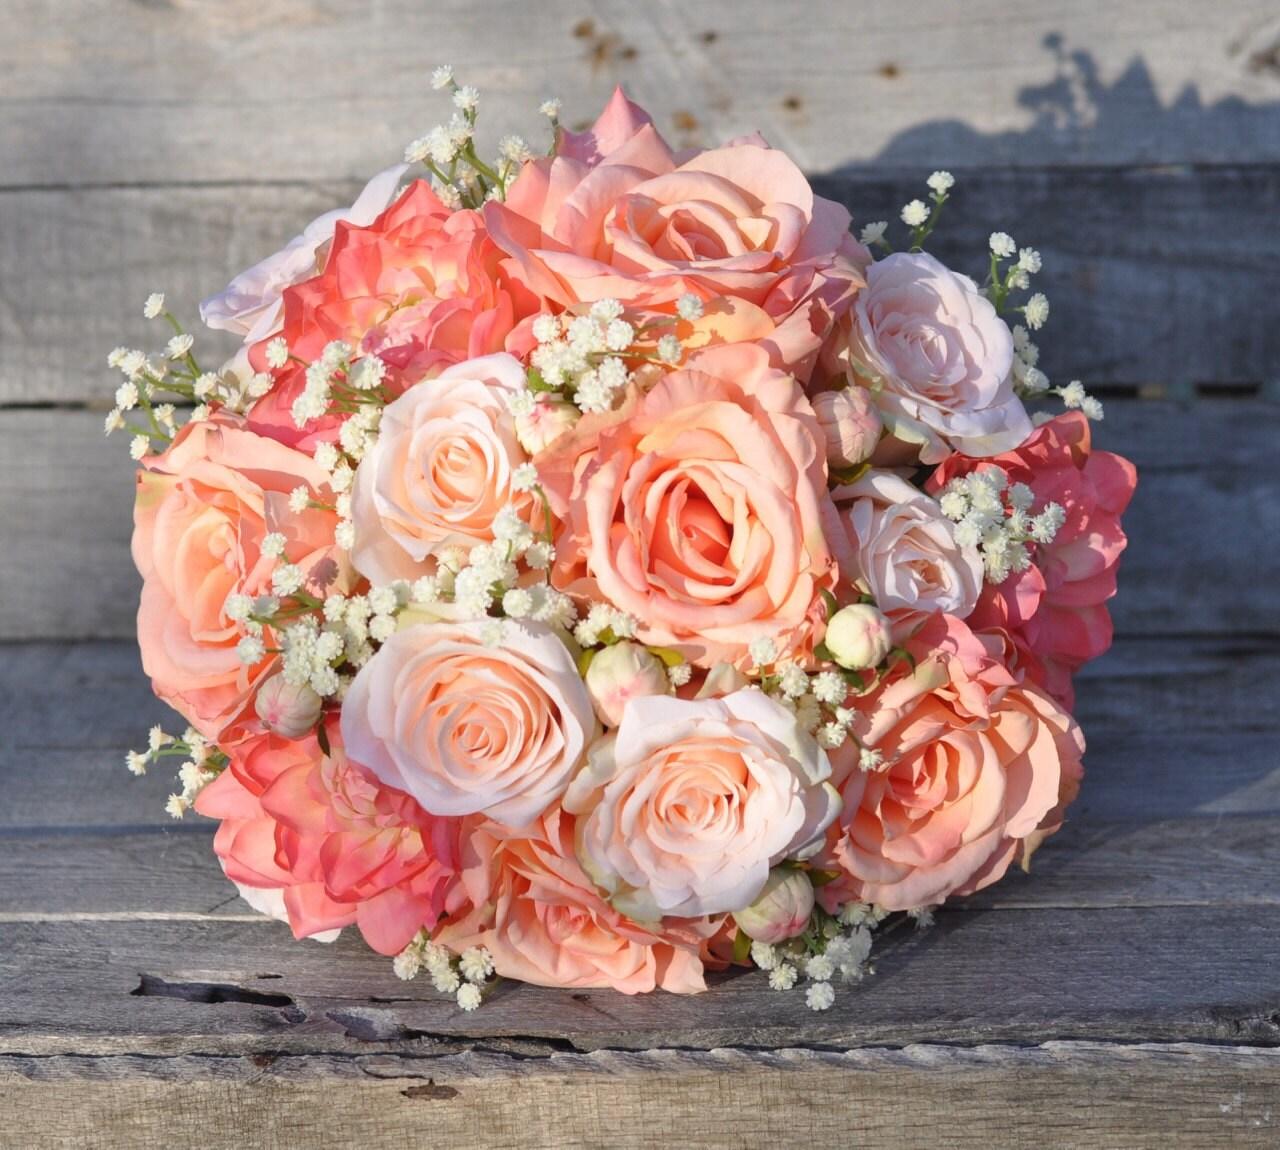 Wedding Flowers Names: Peach Rose Wedding Bouquet Silk Flower Bouquet Made With